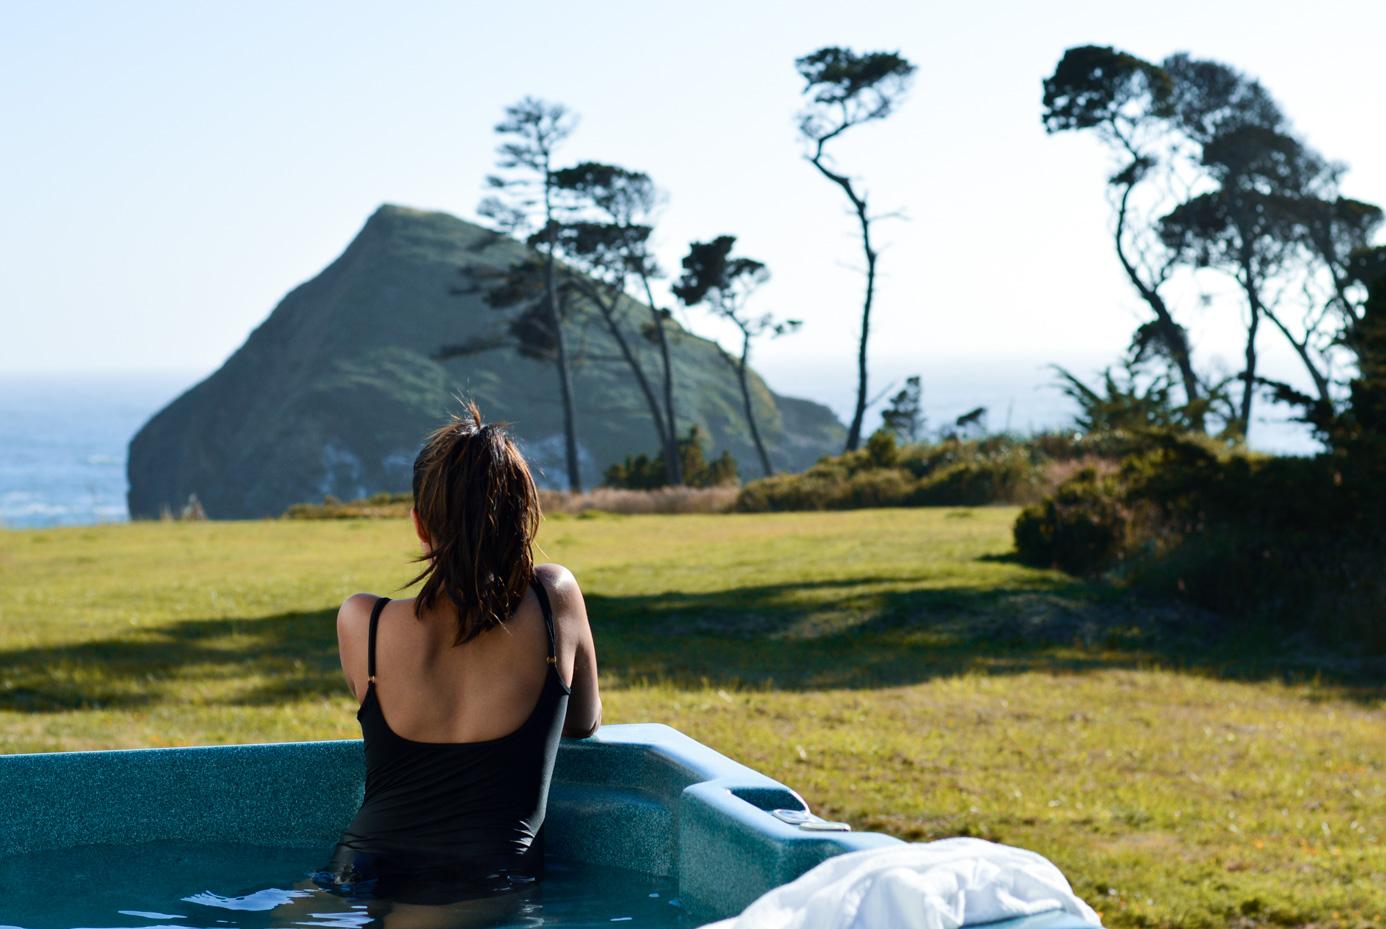 mendocino-little-river-inn-hot-tub-vacation-style-california-roadtrips 7